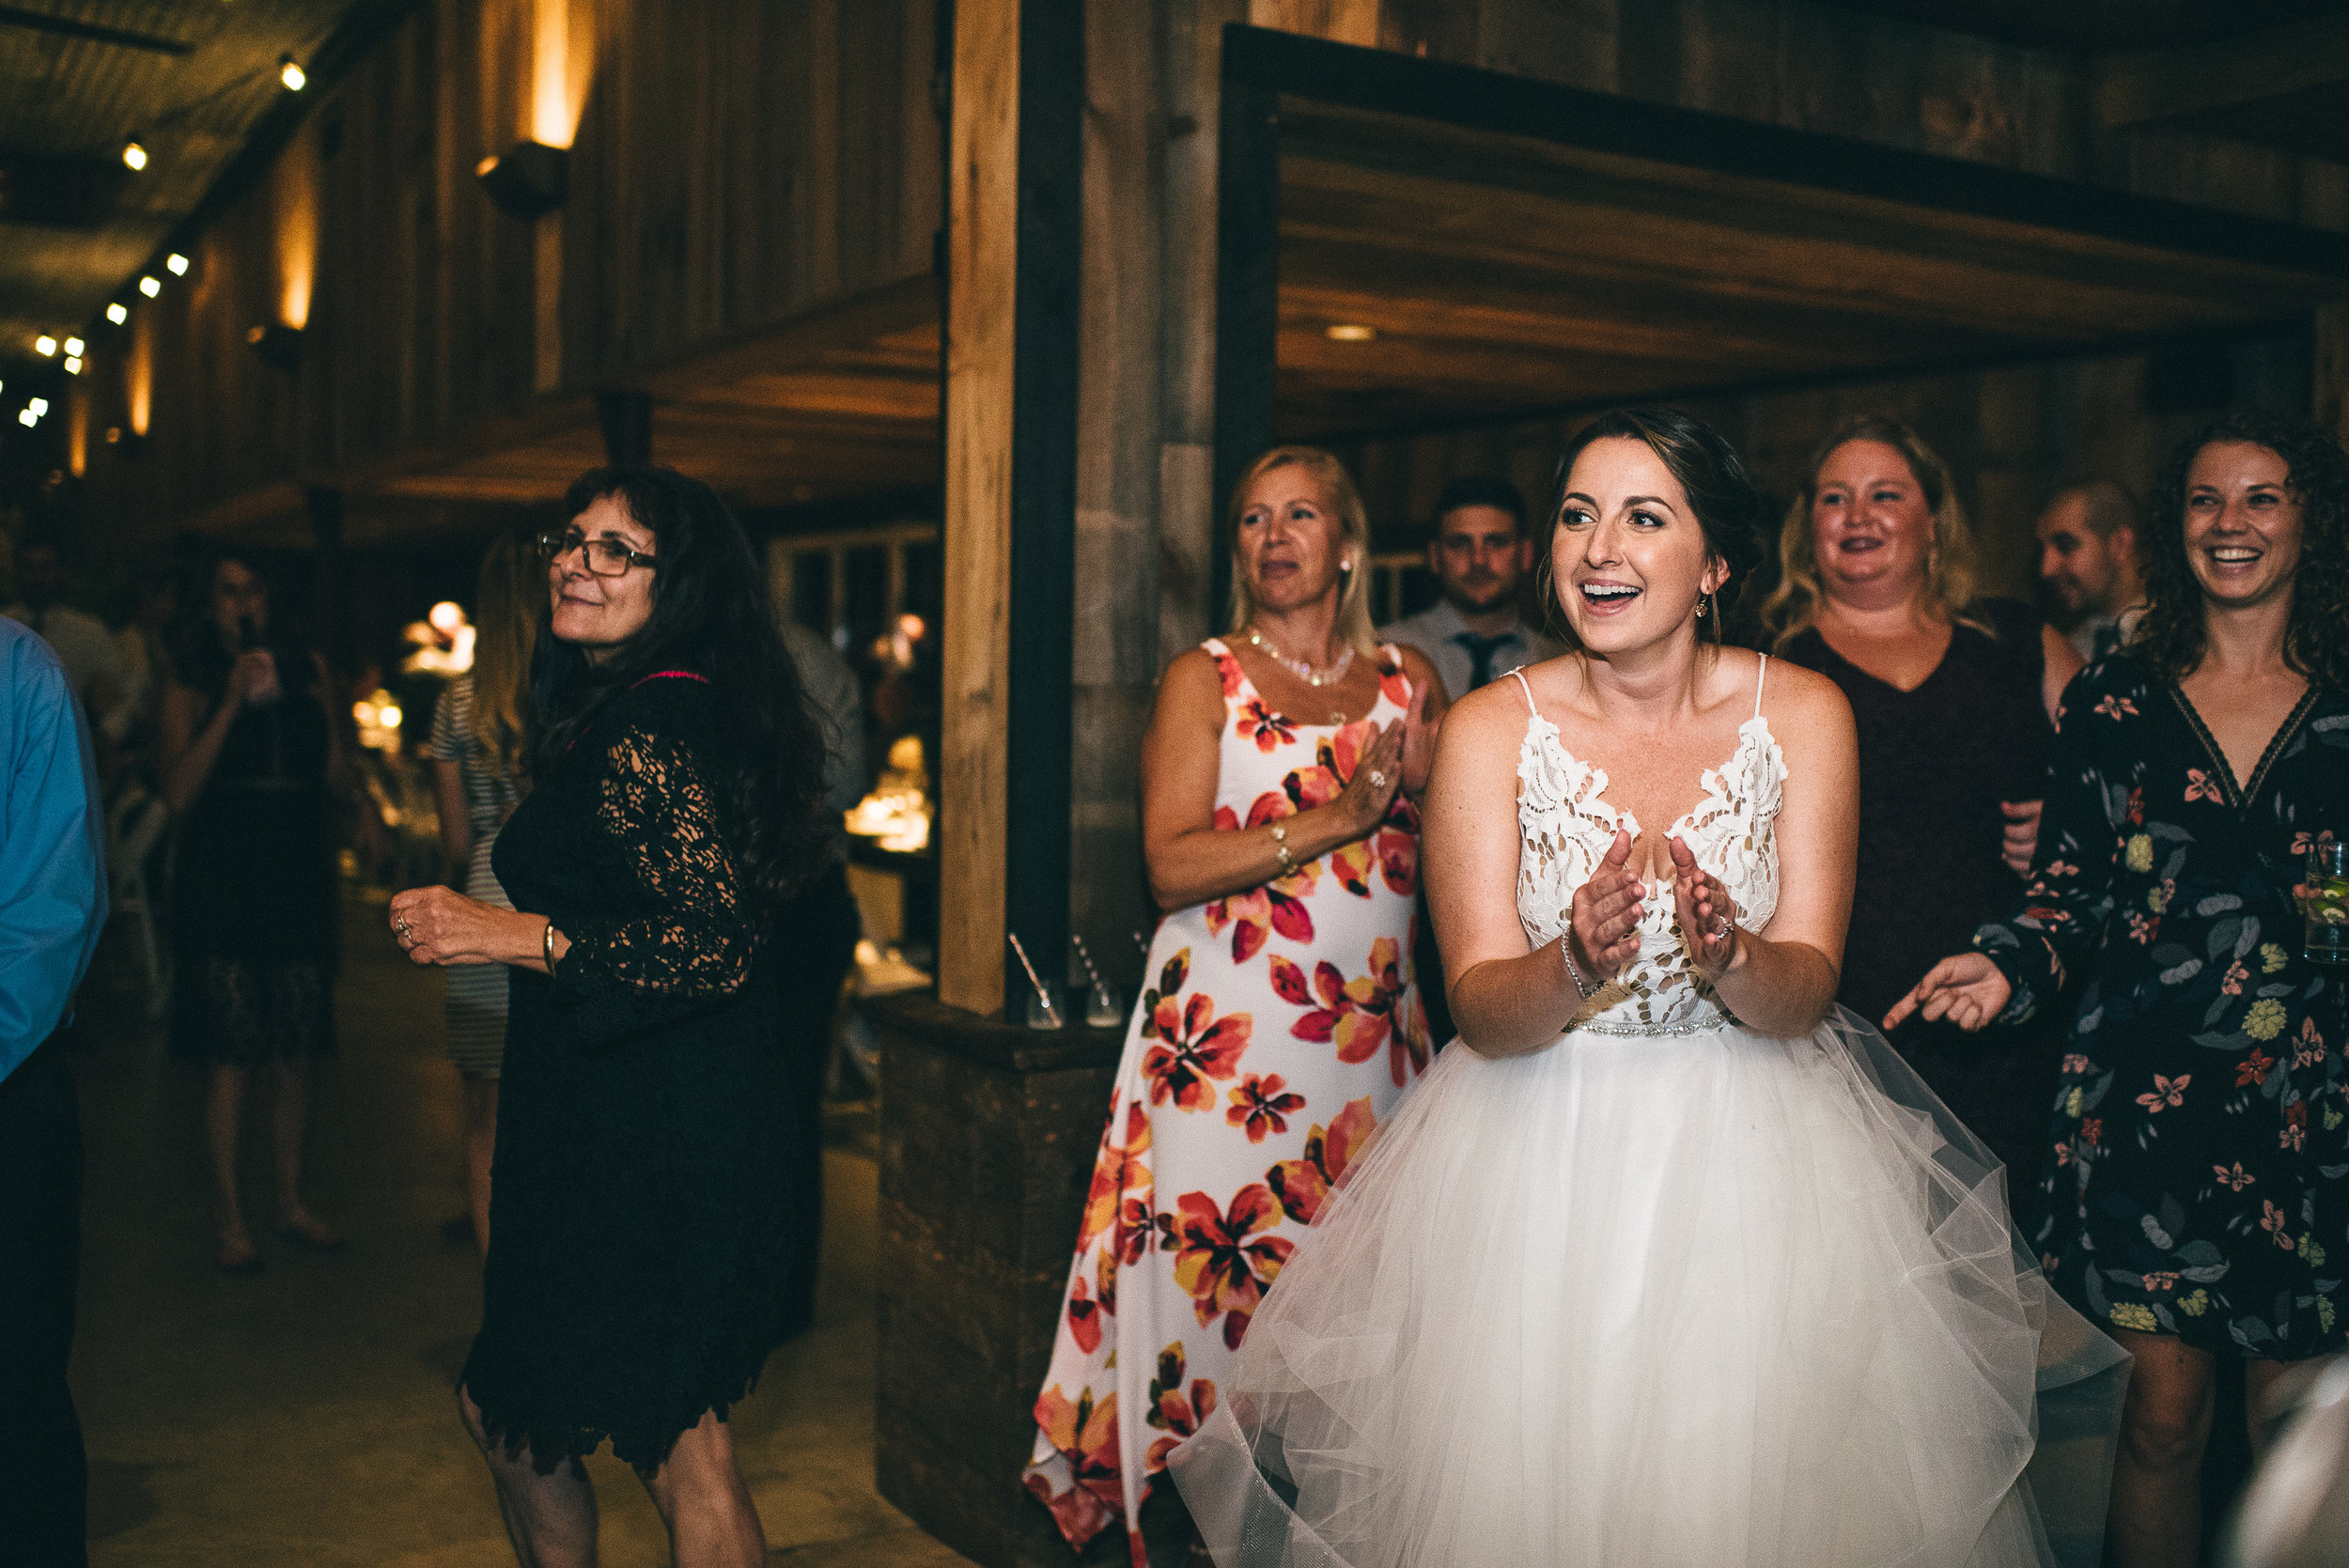 South Farms Wedding Main Line PA Wedding Planner_1-37.JPG